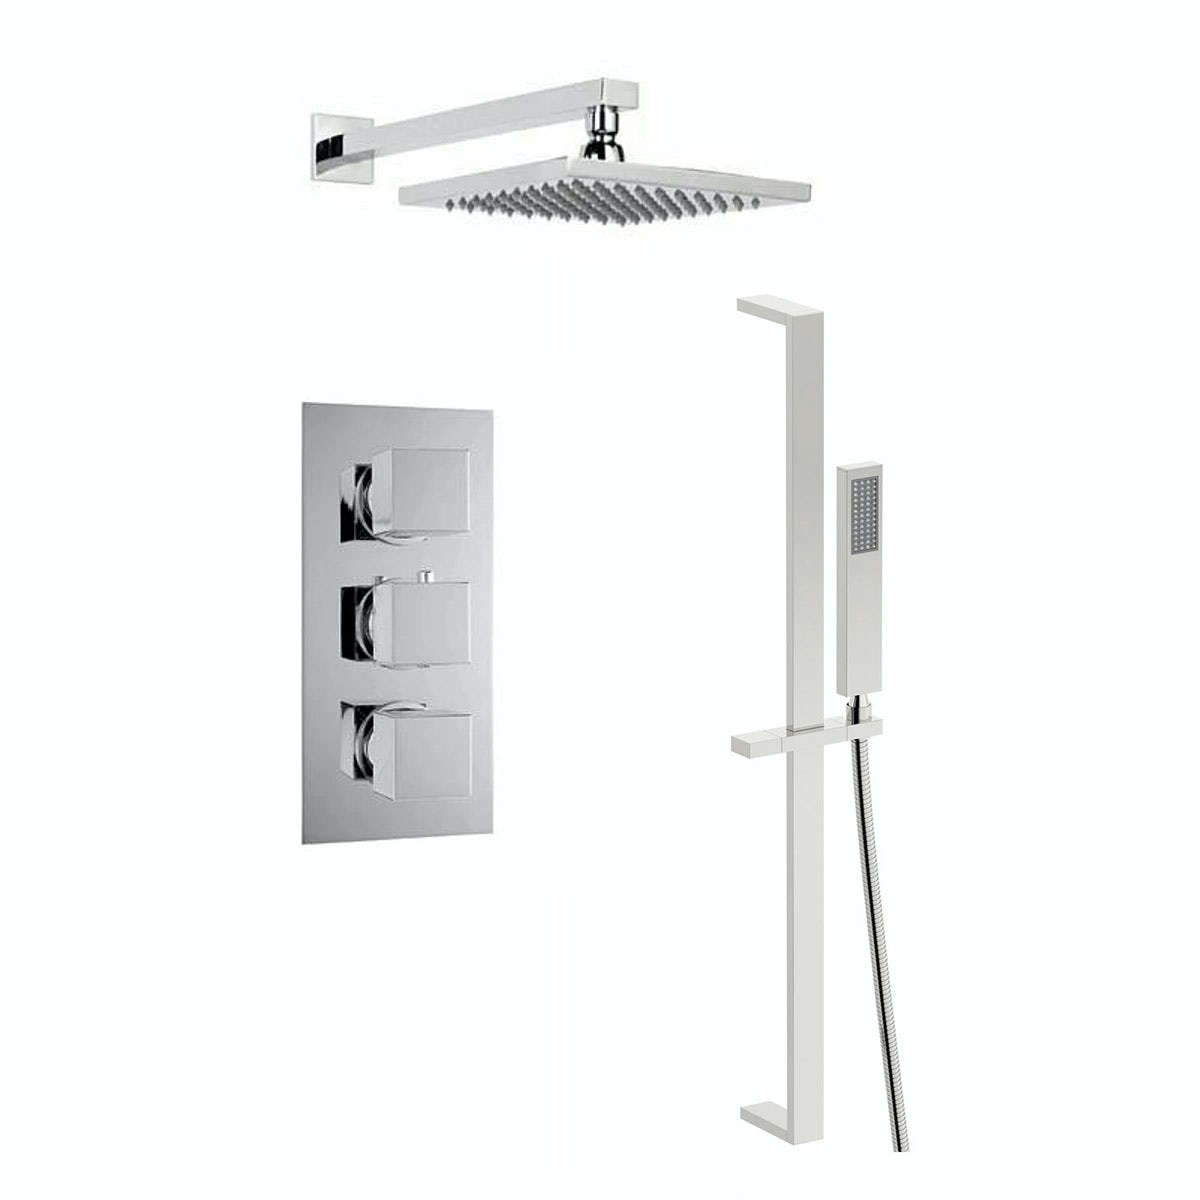 Mode Cubik Thermostatic Triple Shower Valve Shower Set ...